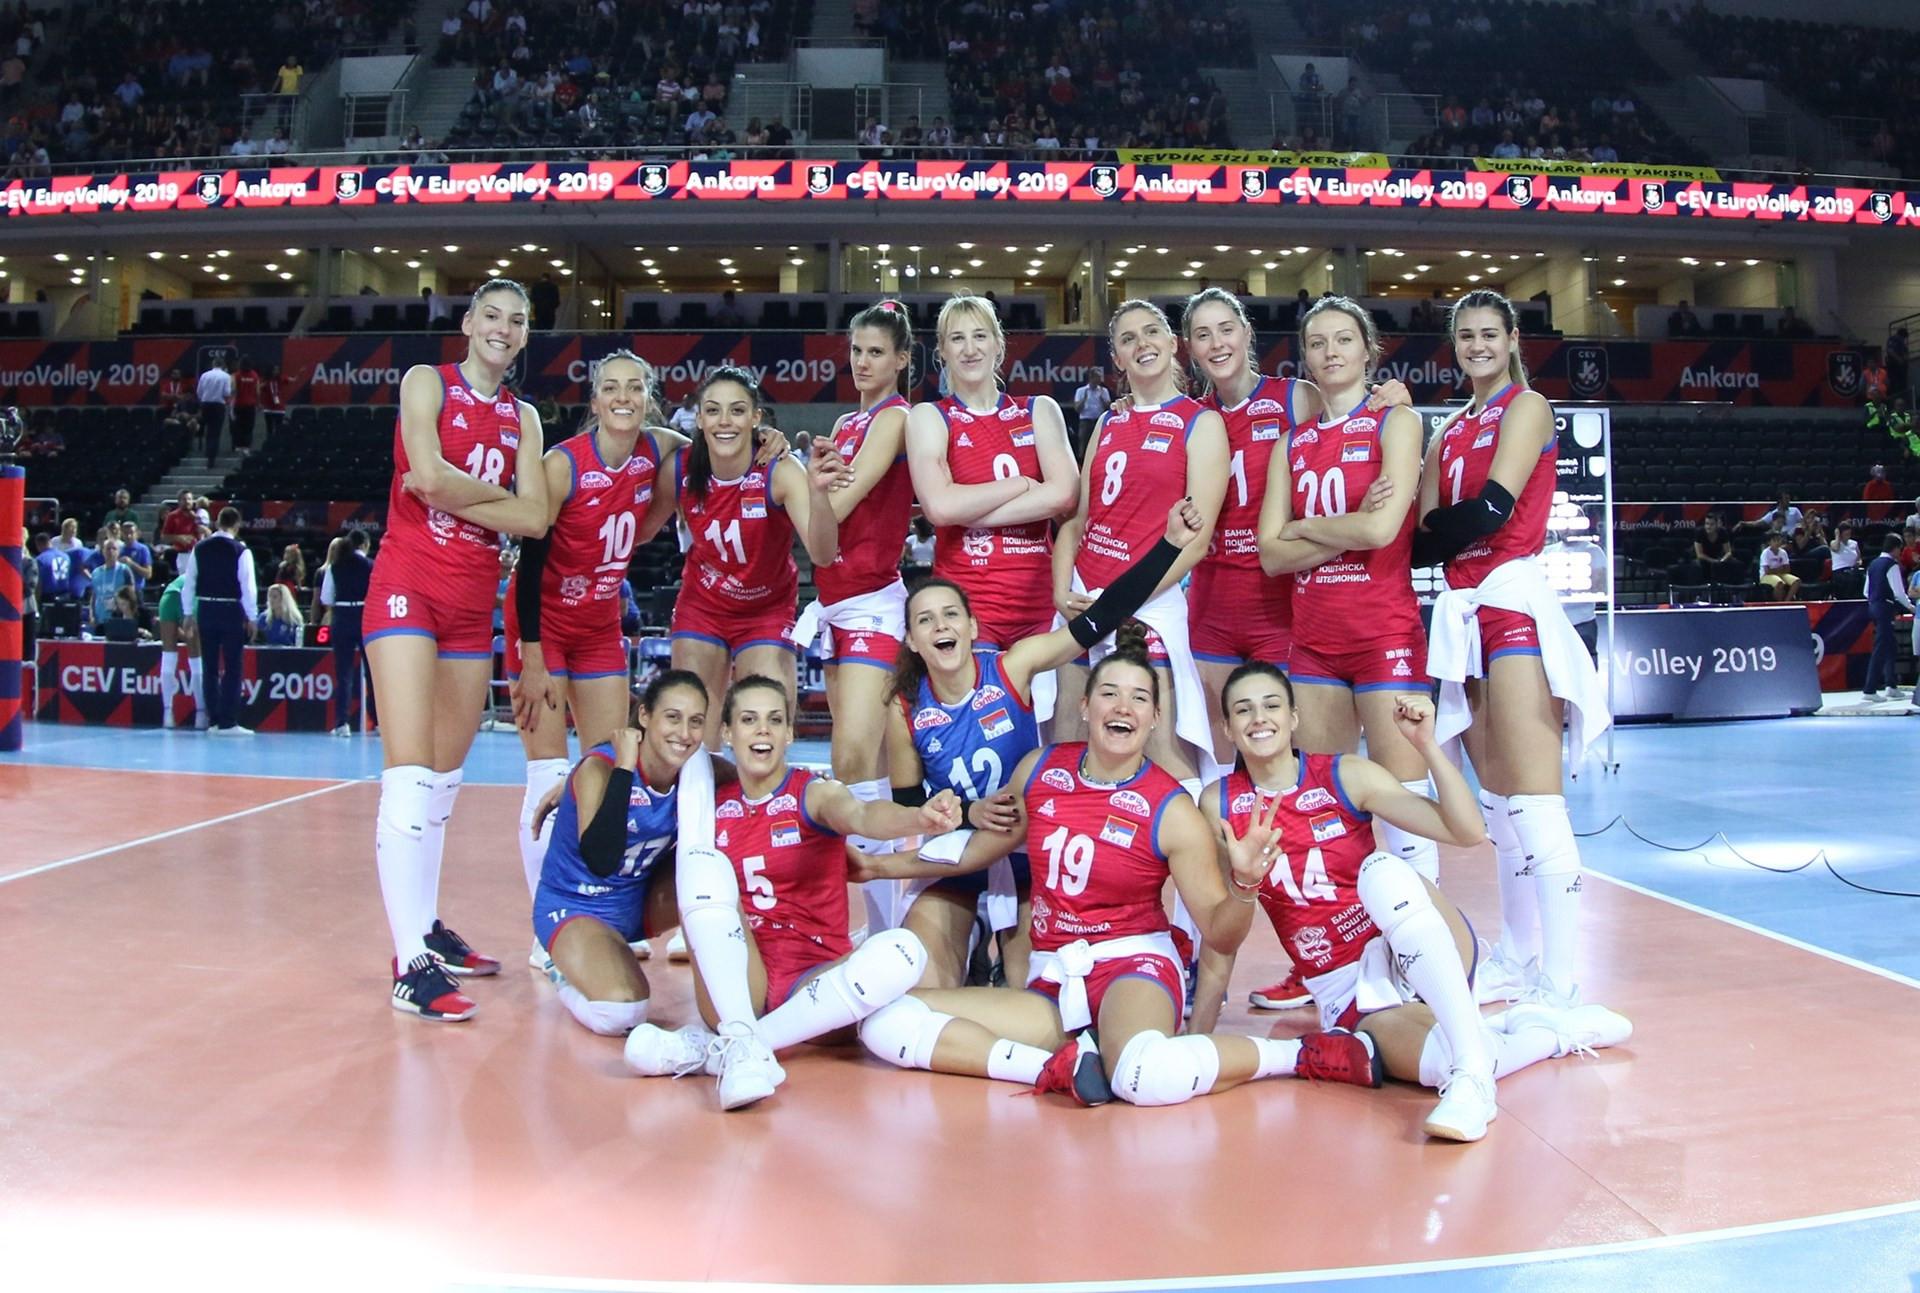 Serbia beat Bulgaria to reach semi-finals at Women's European Volleyball Championship